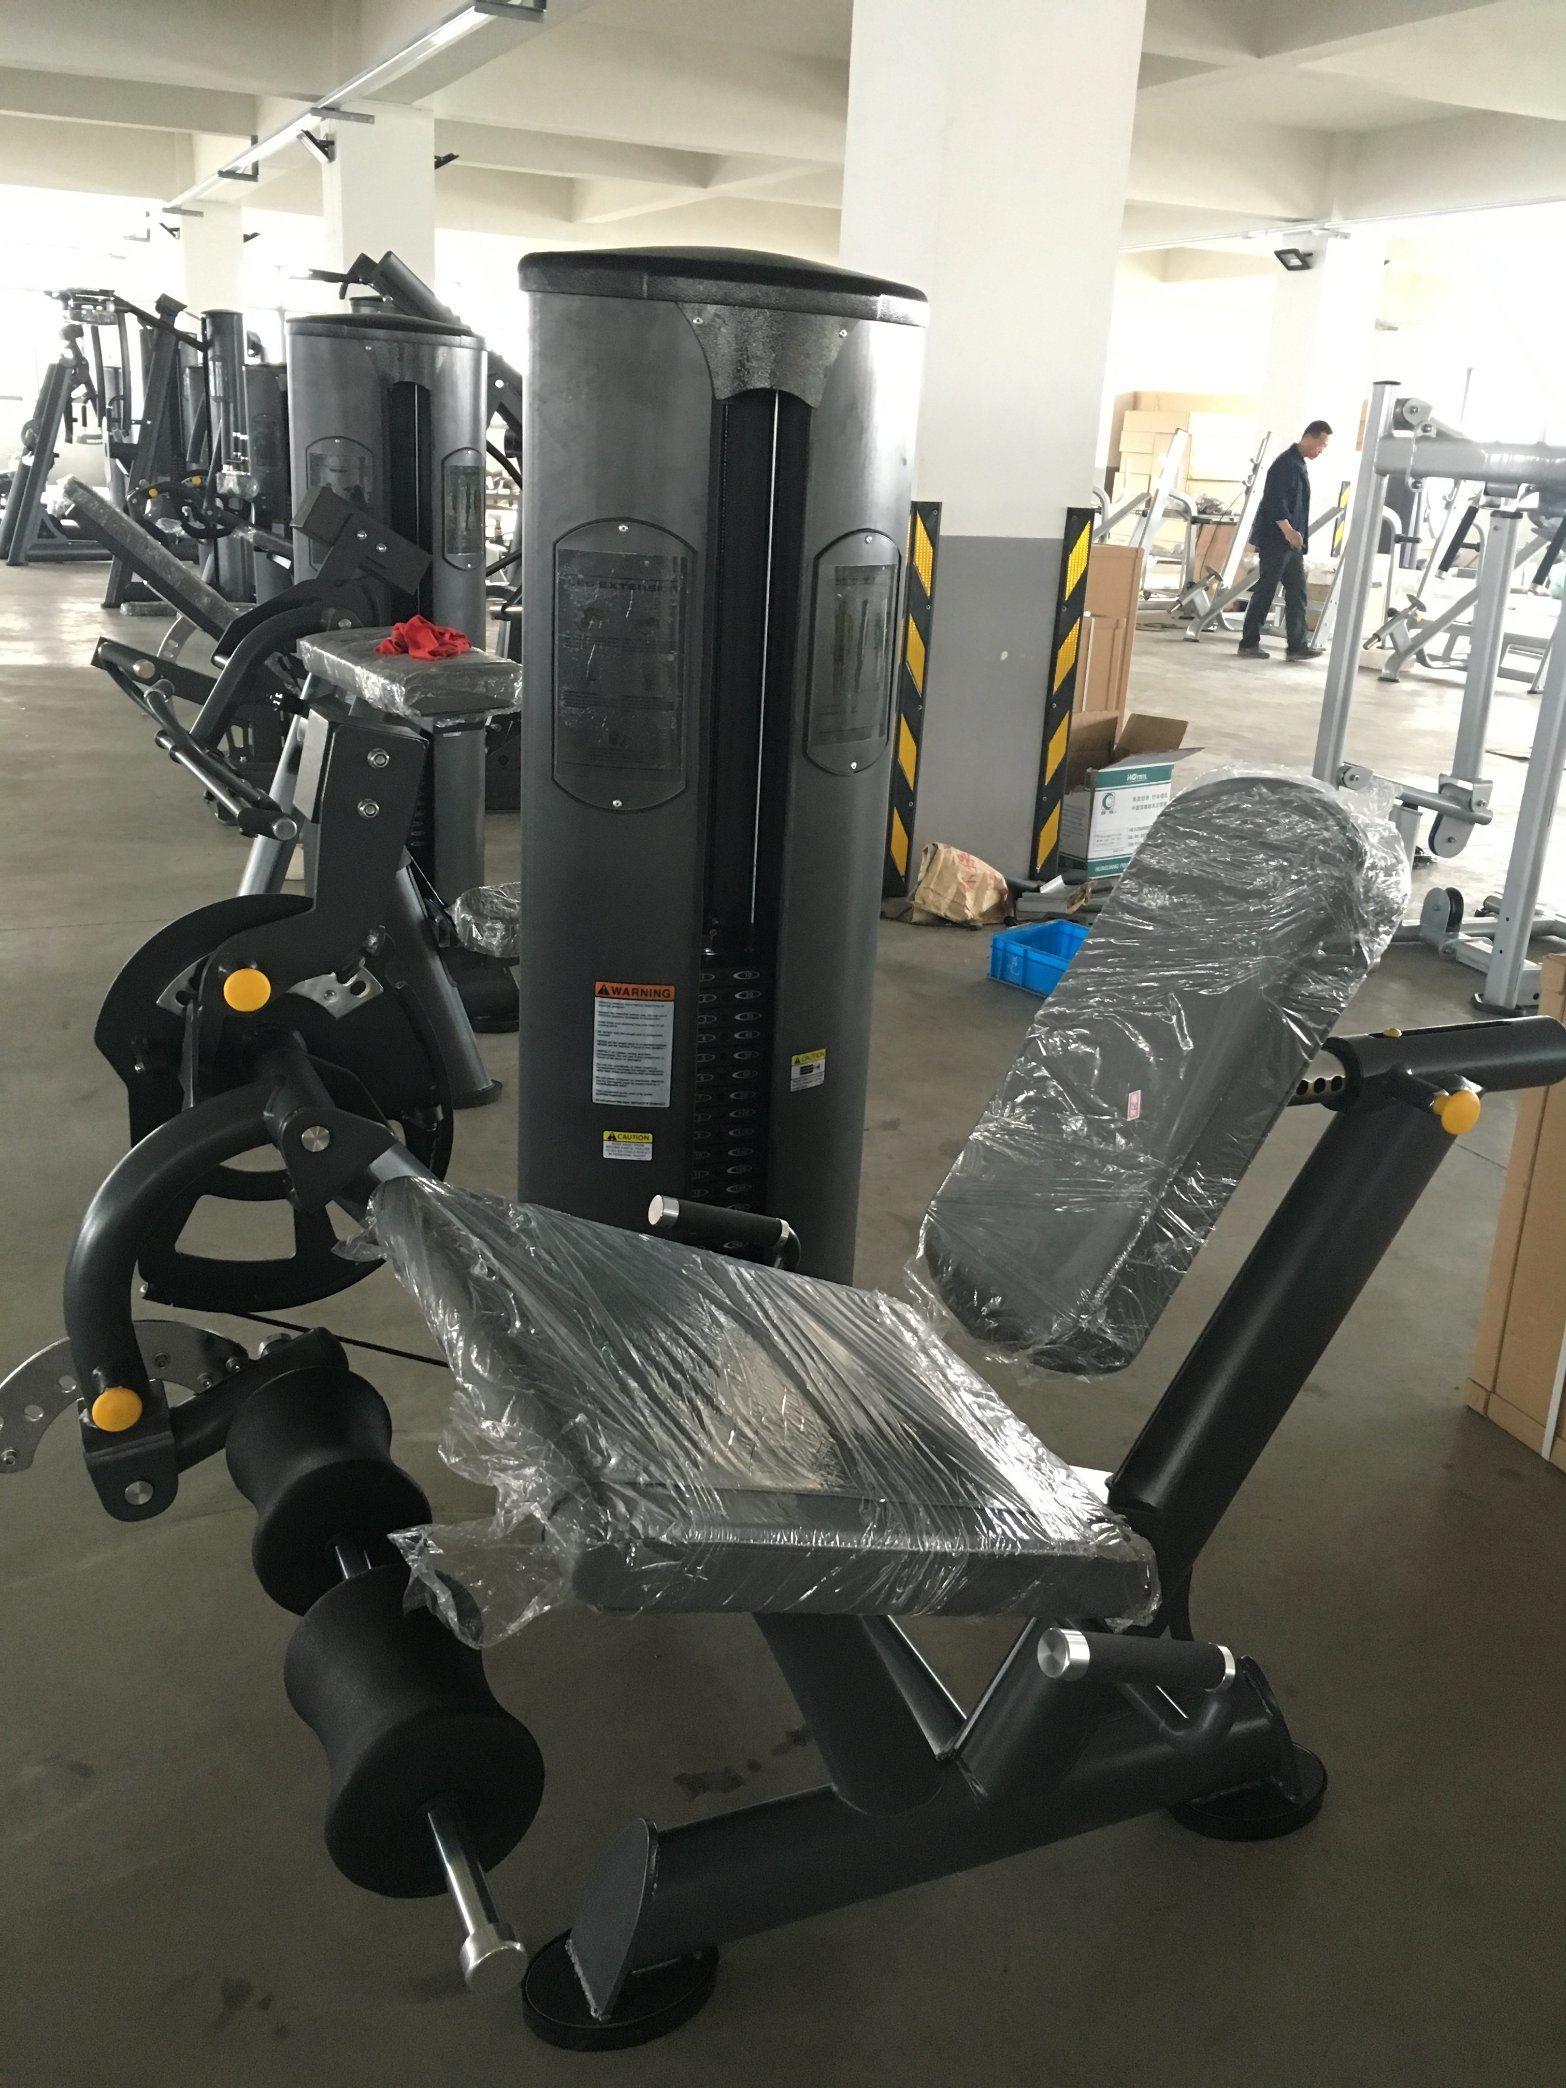 Freemotion Gym Equipment Lat High Row (SZ03)